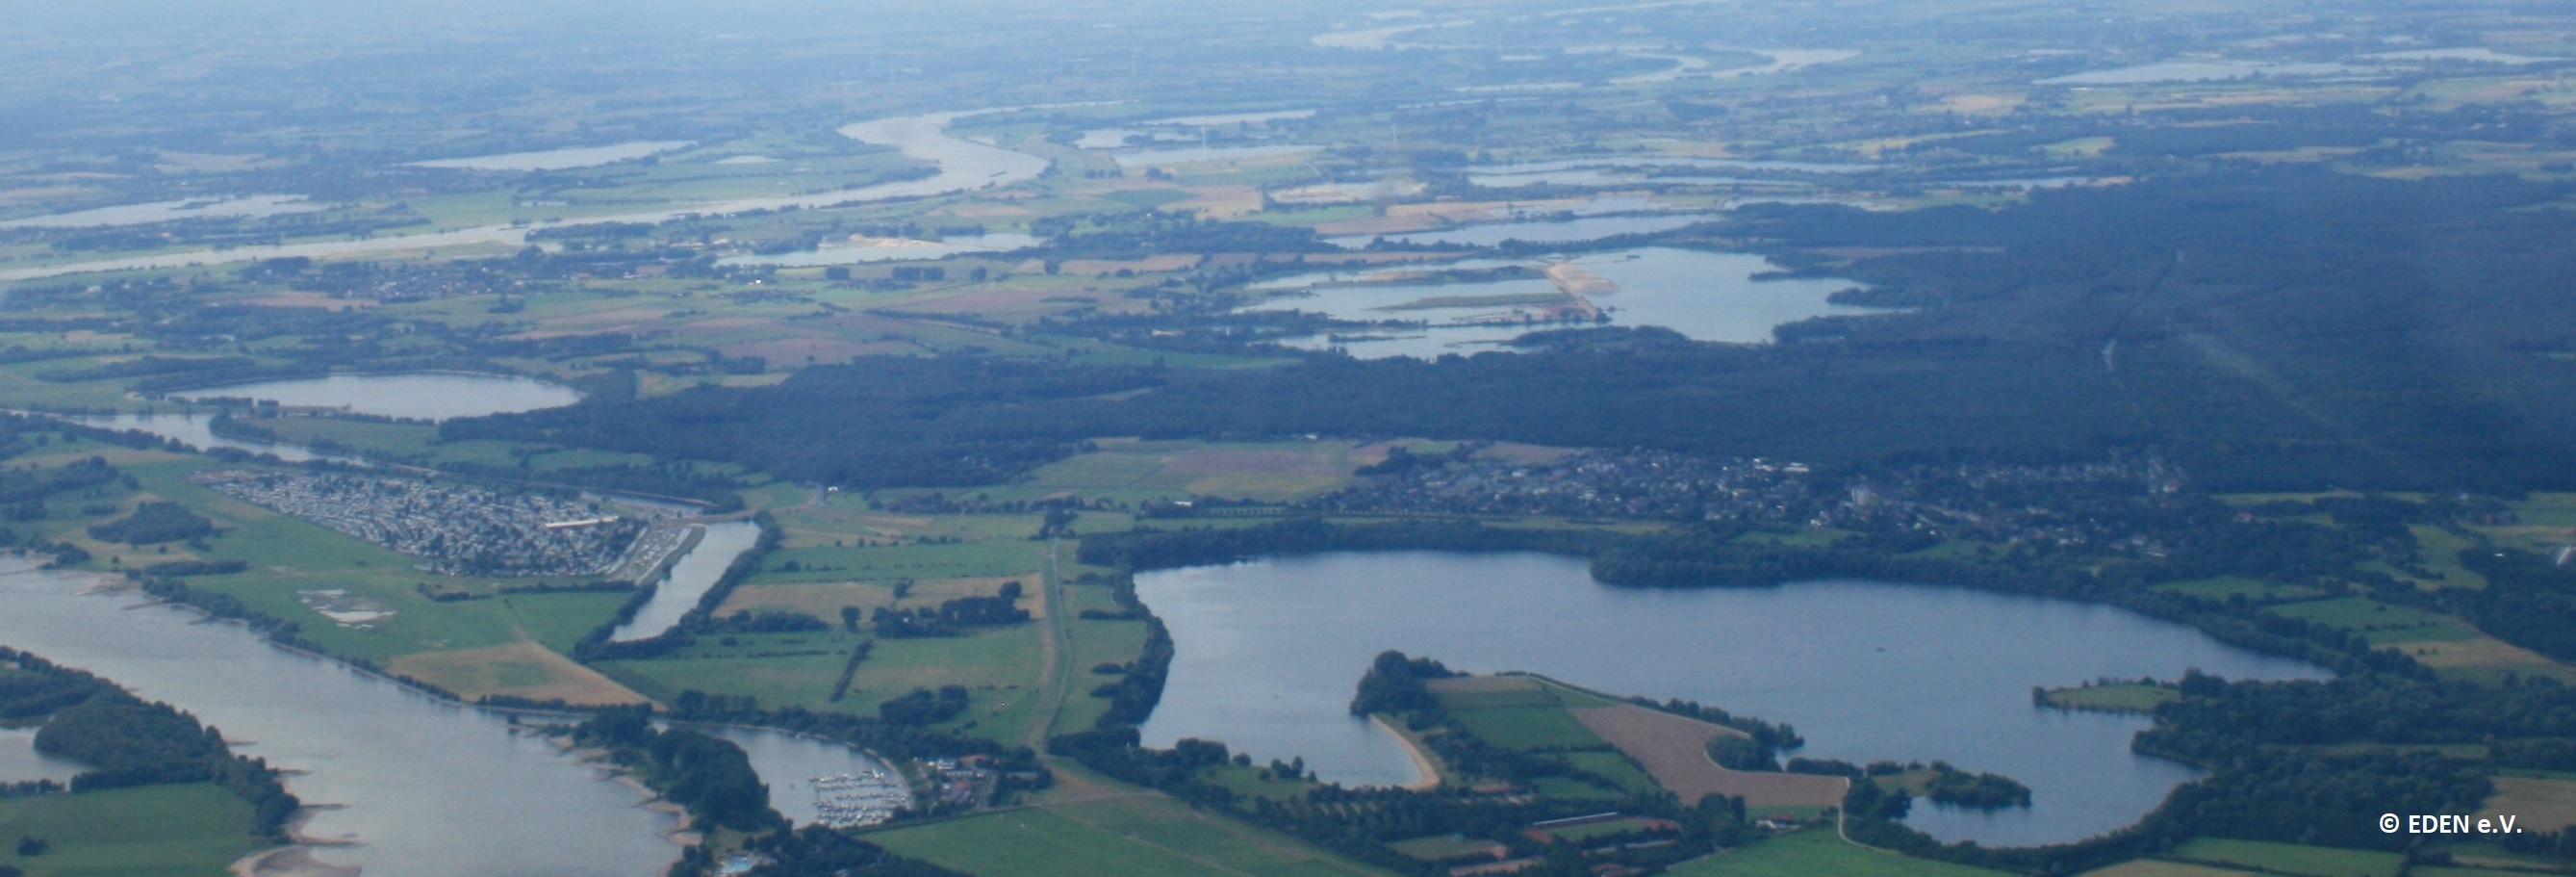 Kies am Niederrhein